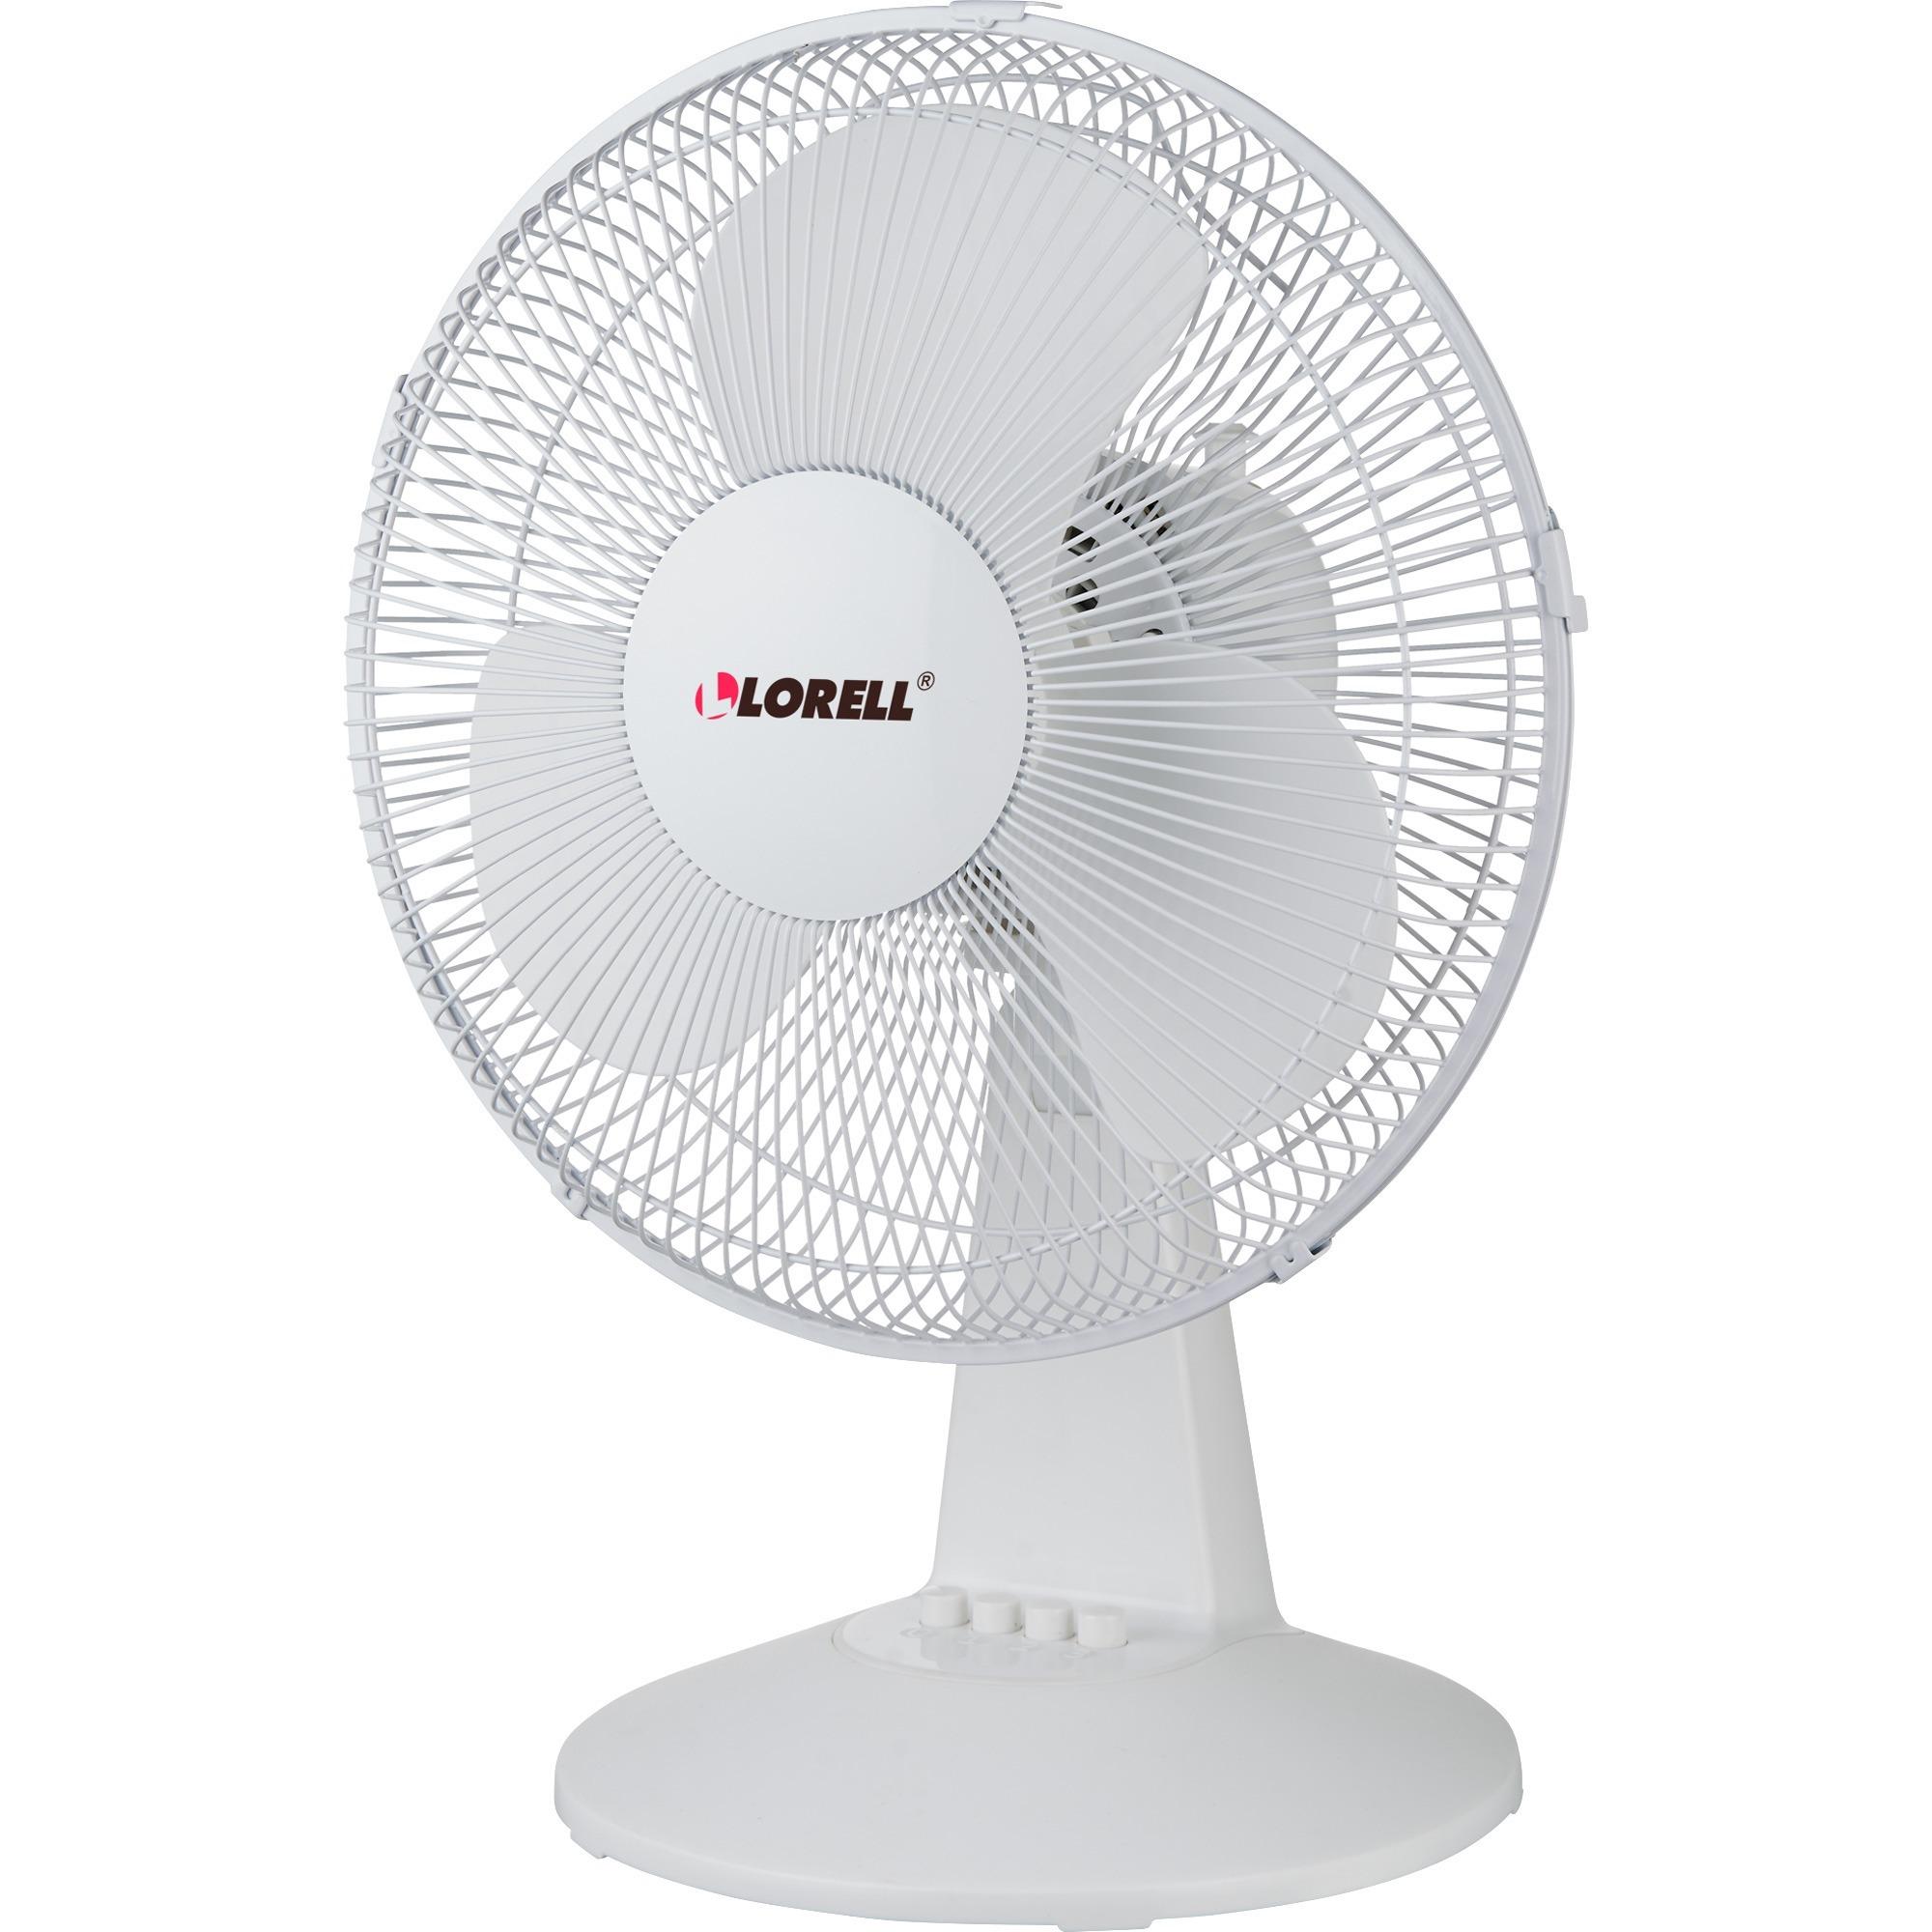 Oscillating Desk Fan : Lorell quot oscillating desk fan